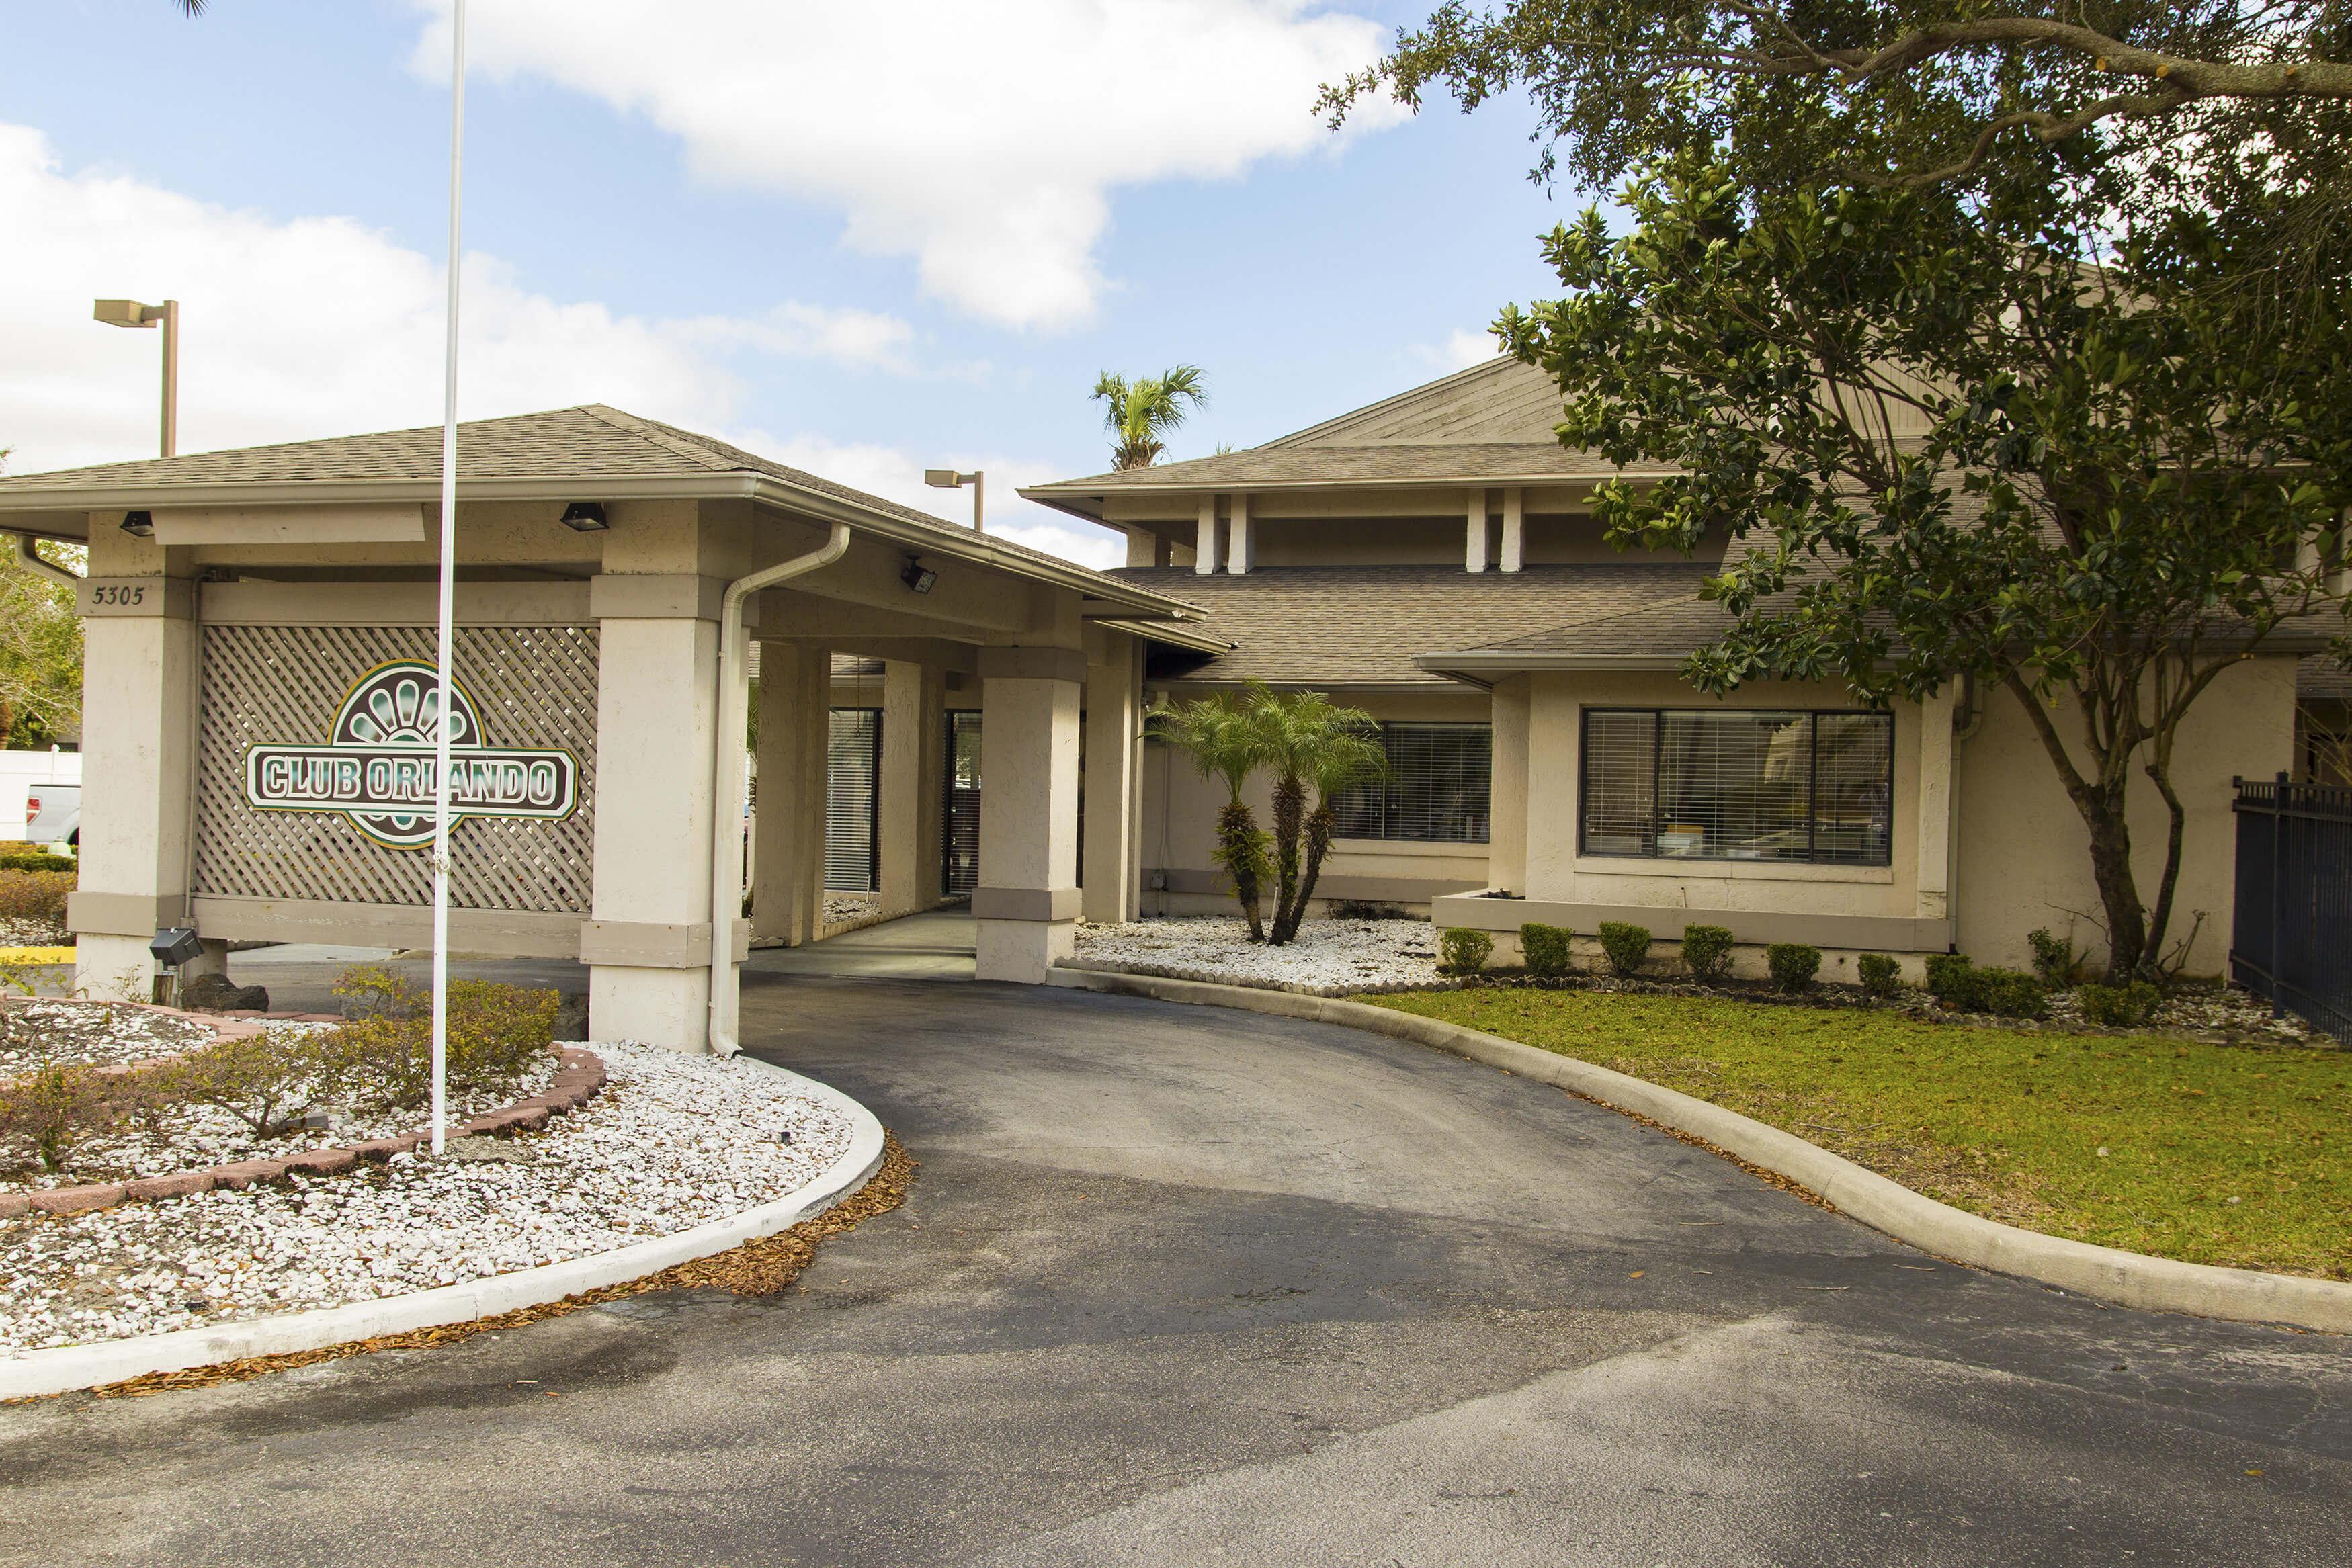 Club Orlando entrance for guest check in | Westgate Resorts in Orlando FL